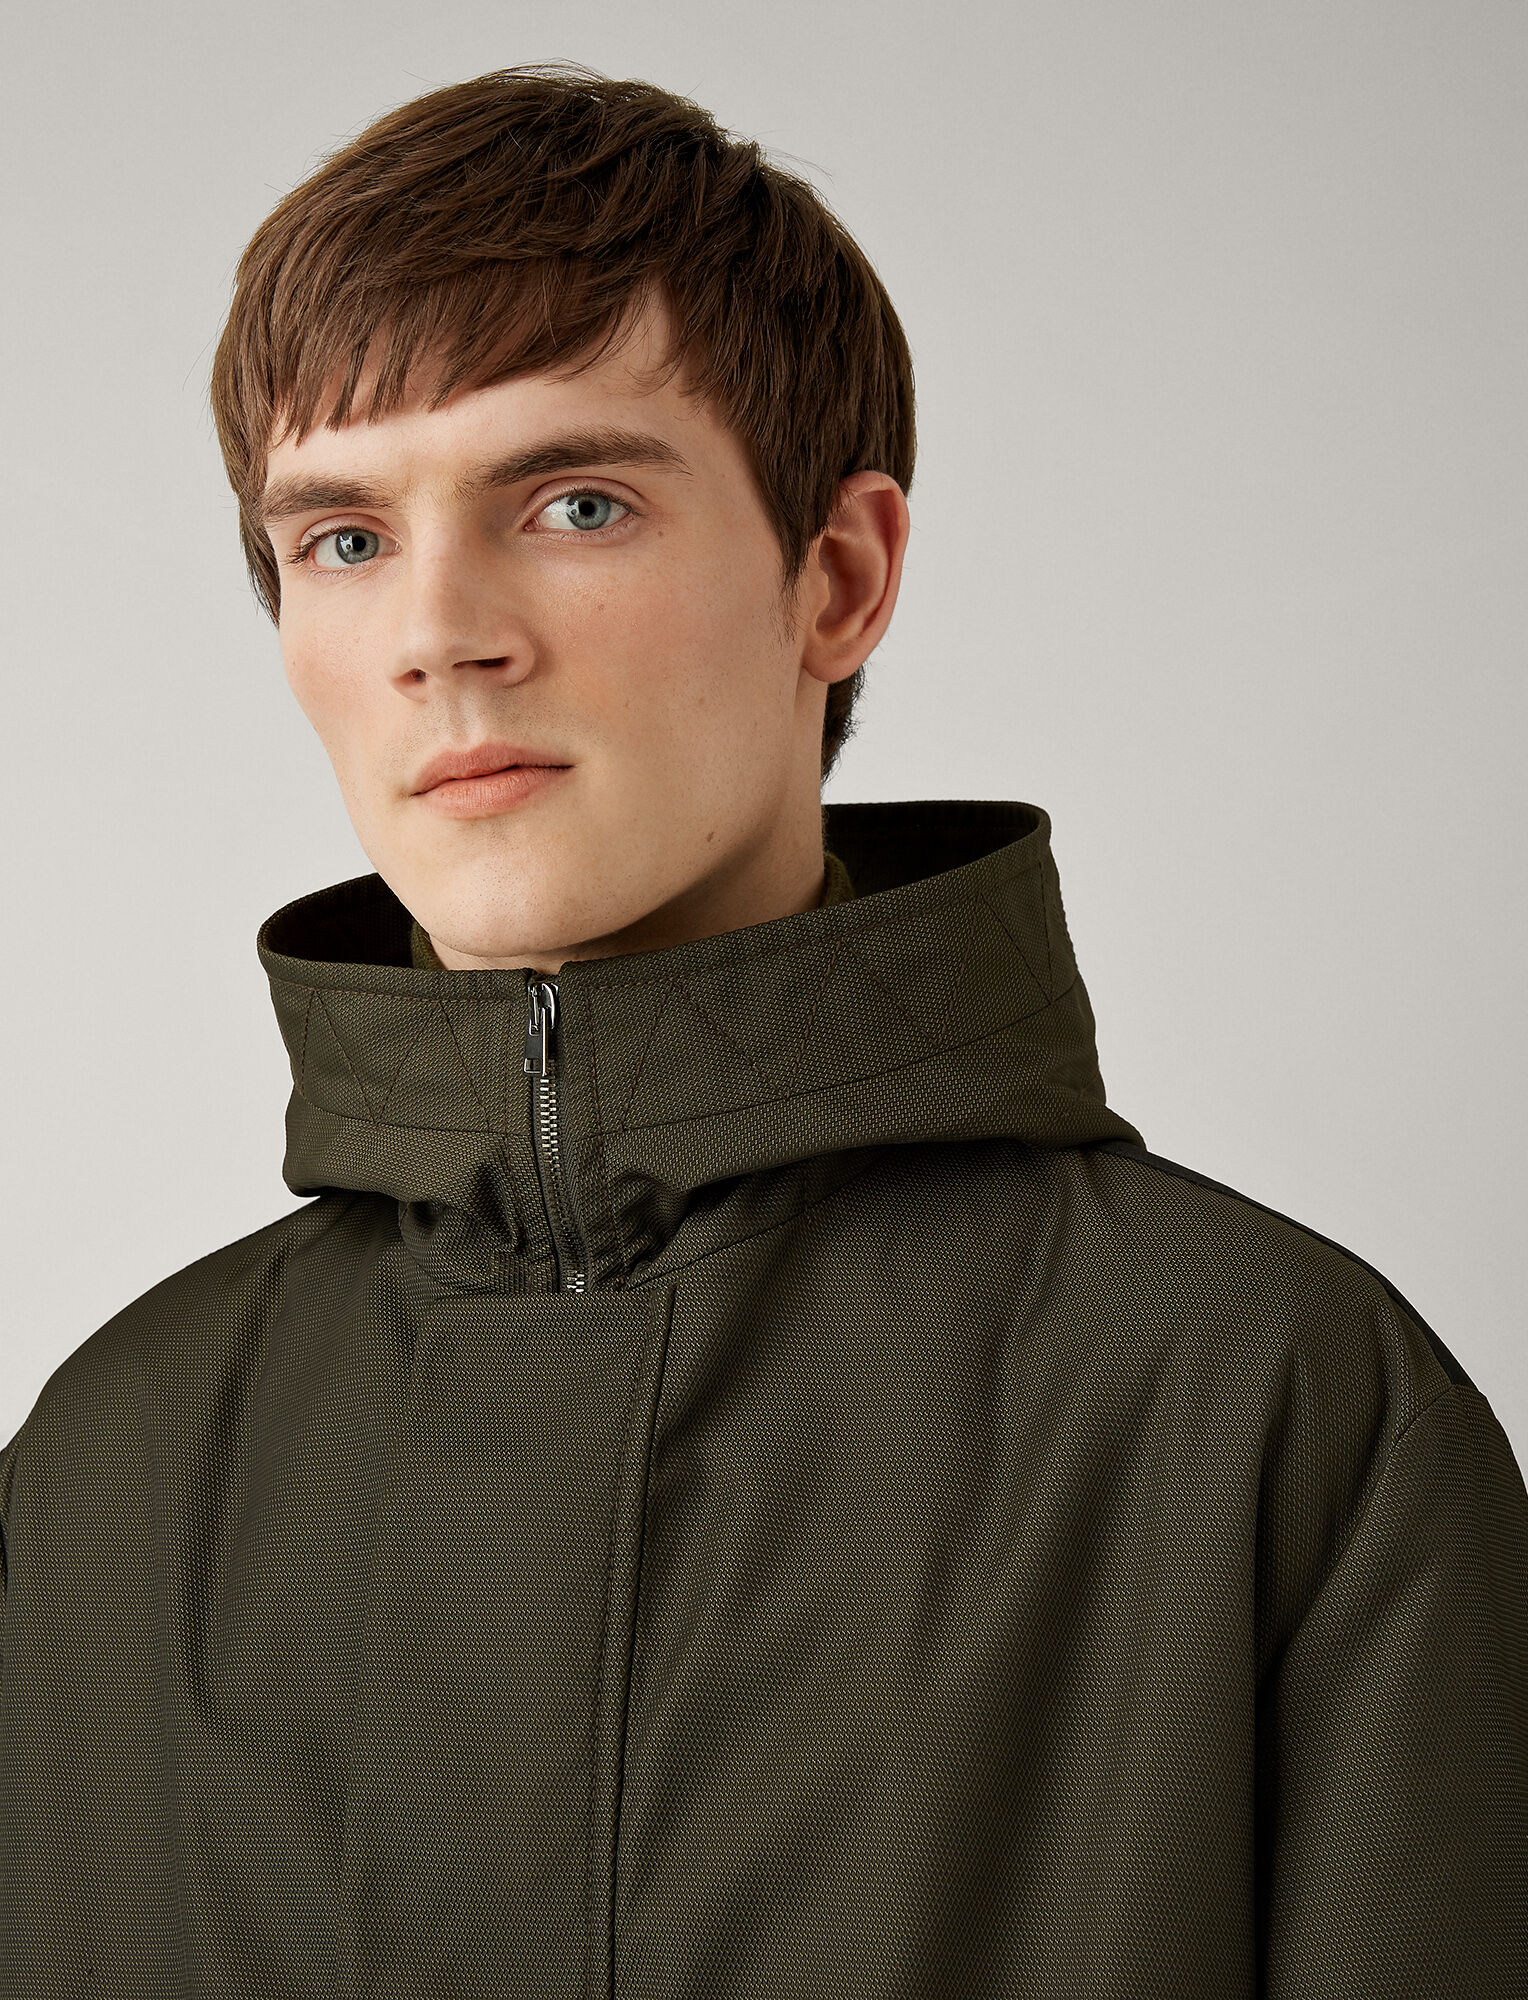 Joseph, Aspin Textured Nylon Coat, in FOREST